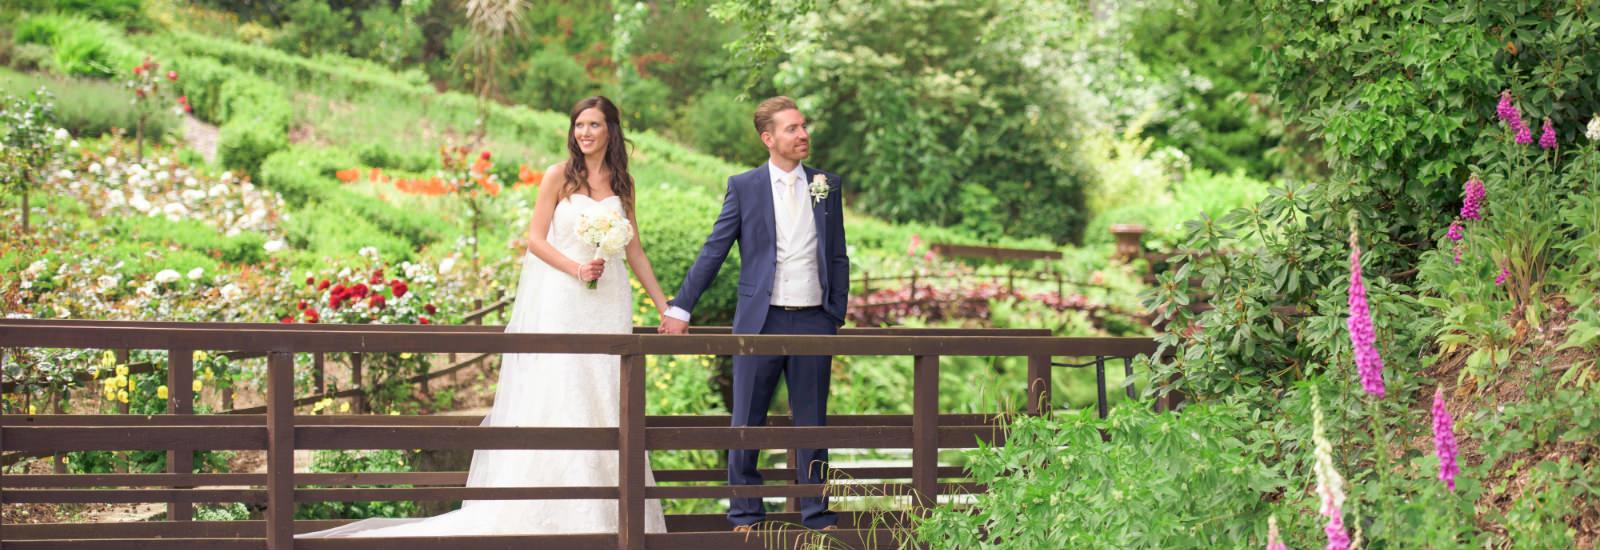 Weddings at Raithwaite Estate